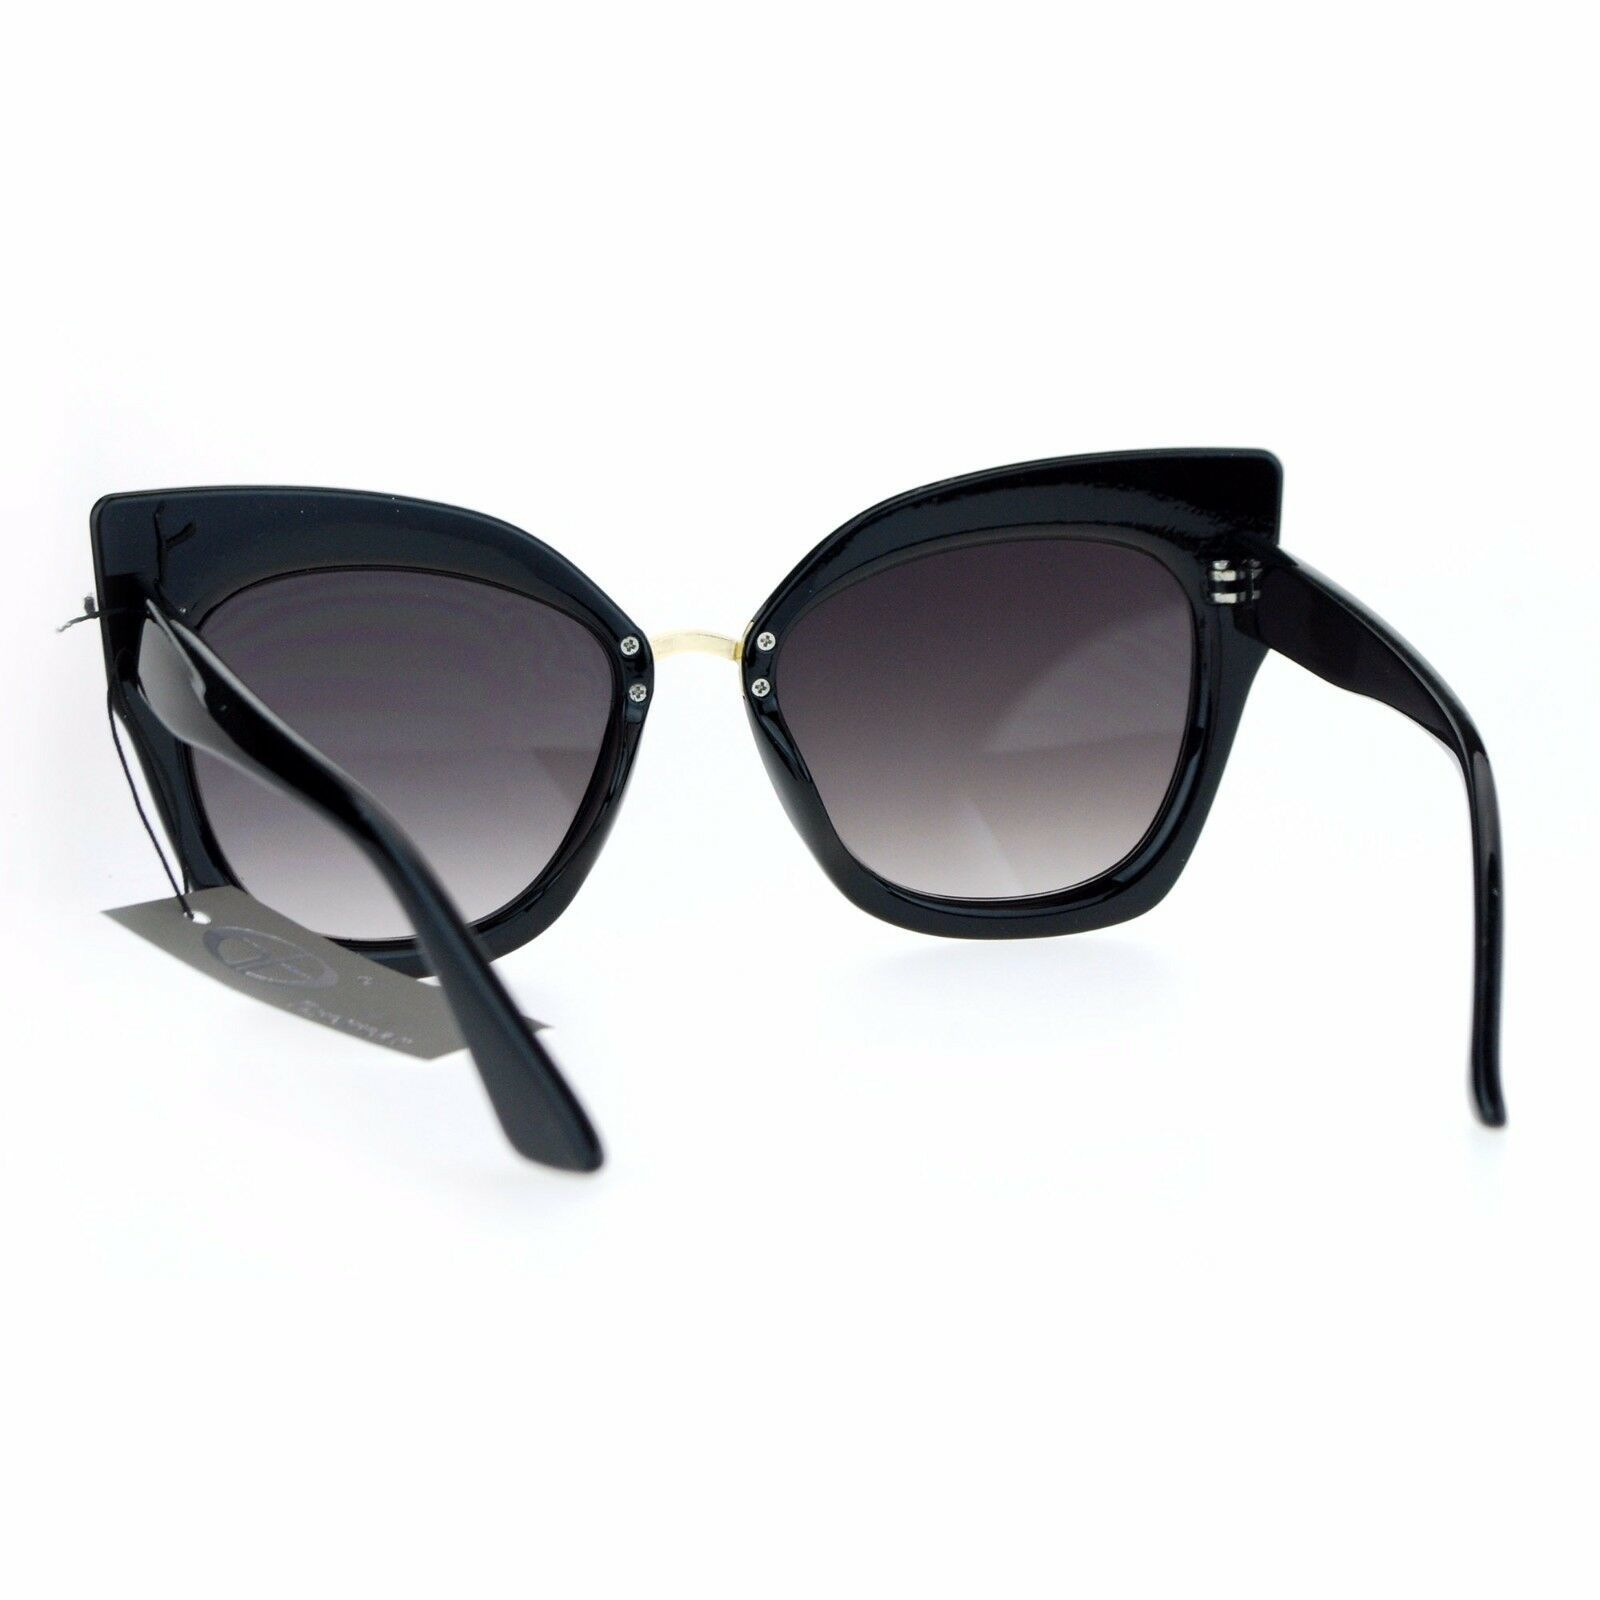 Oversized Fashion Sunglasses Womens Square Cateye Butterfly UV 400 image 7